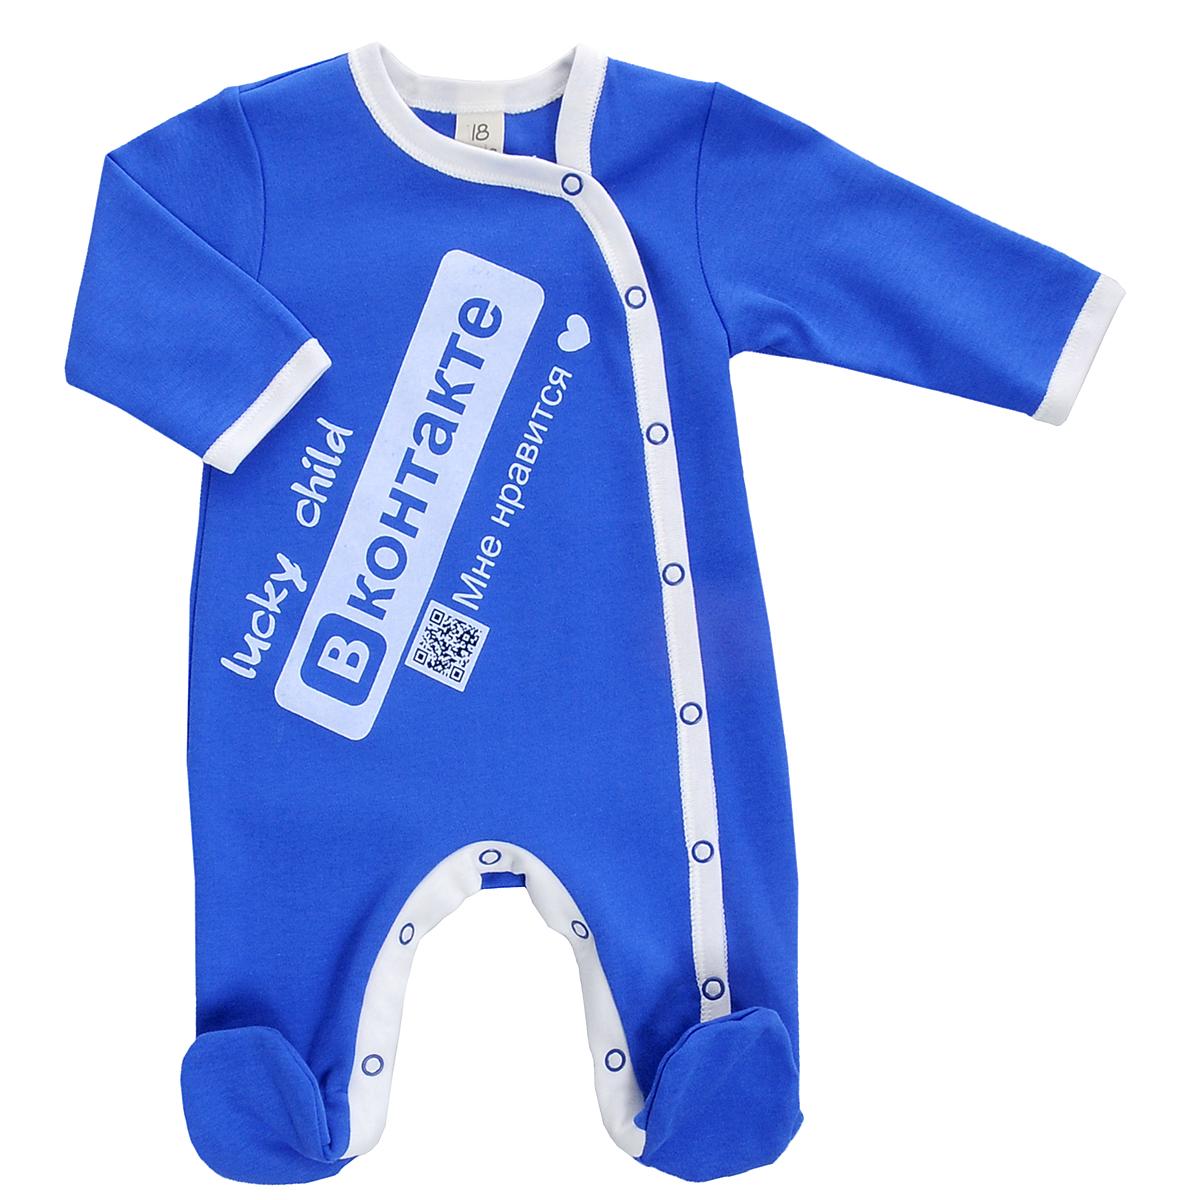 Комбинезон для мальчика Lucky Child, цвет: синий. 9-162. Размер 80/86